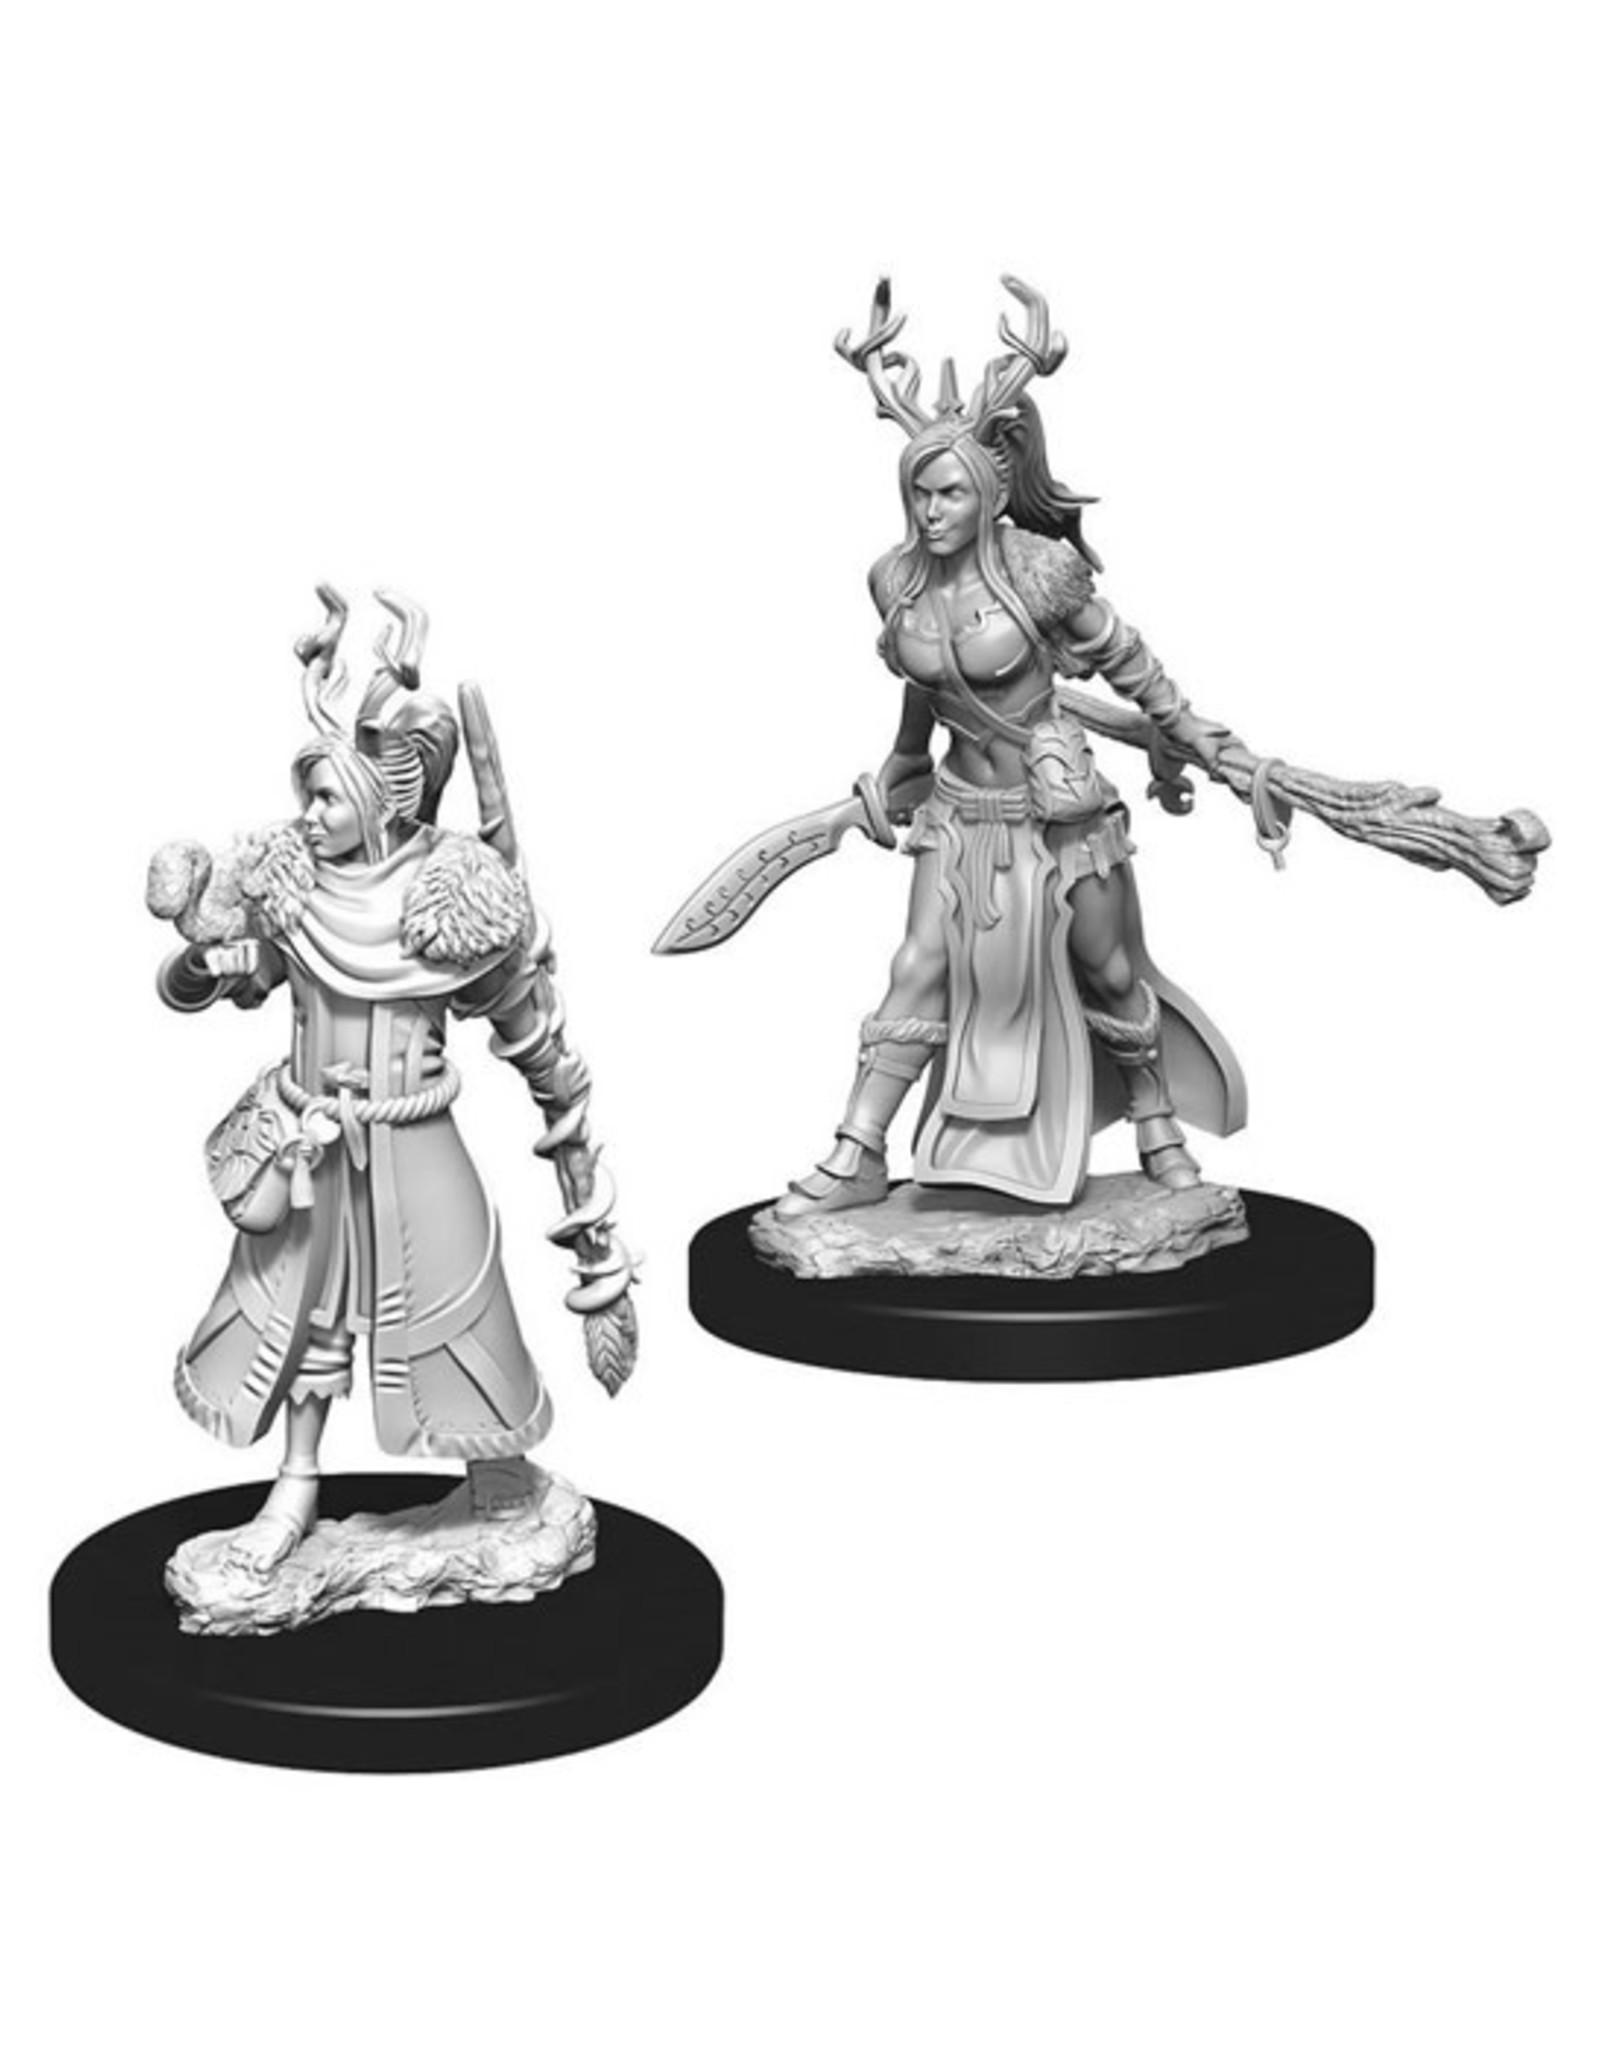 Dungeons & Dragons Dungeons & Dragons: Nolzur's - Human Female Druid